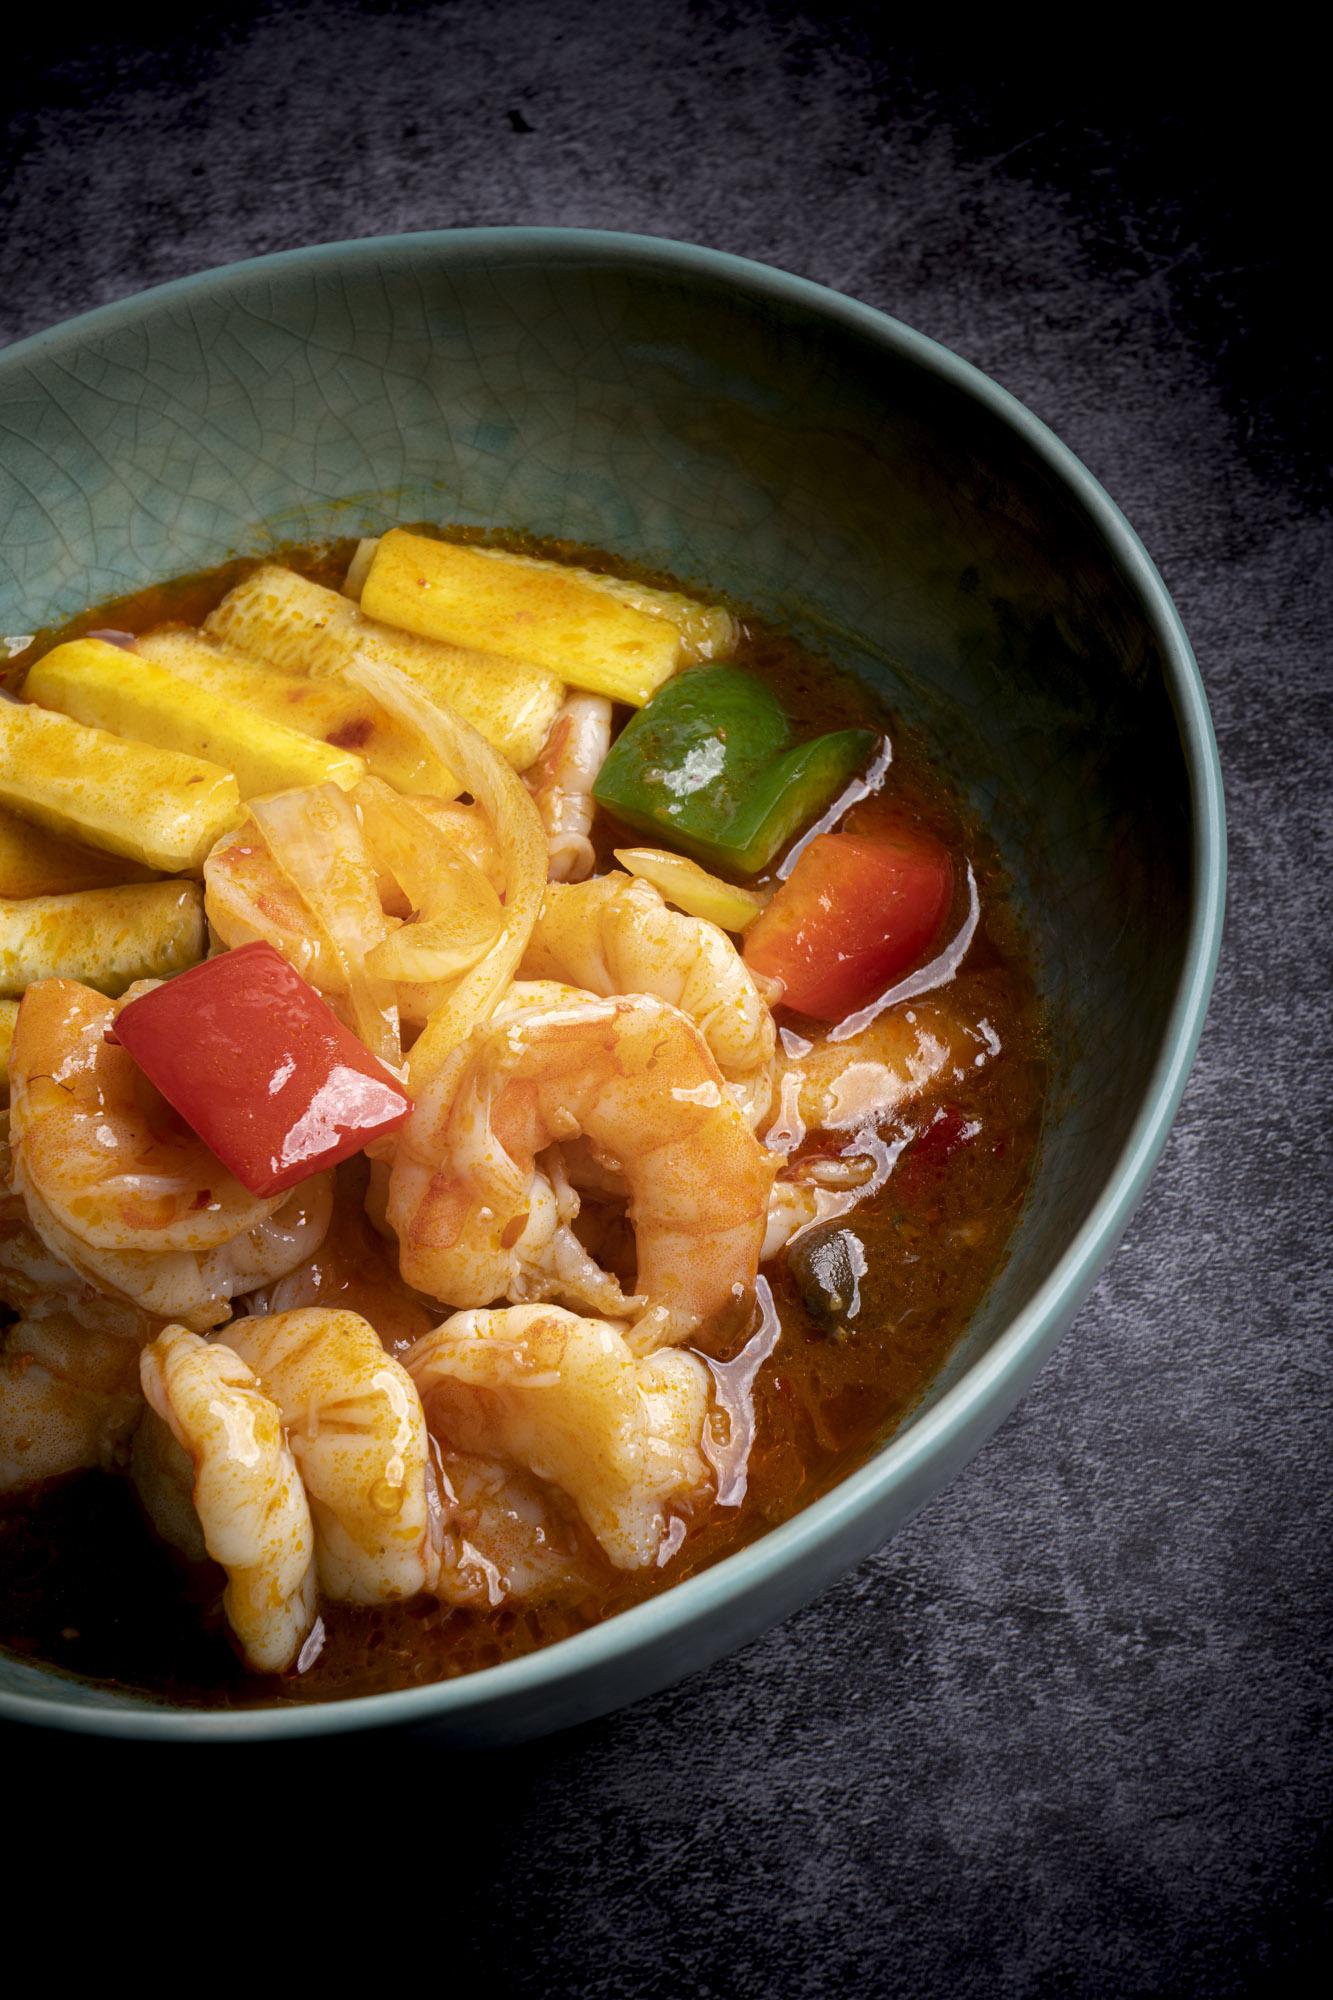 香辣蝦球   Crevettes du Chef (piquantes)